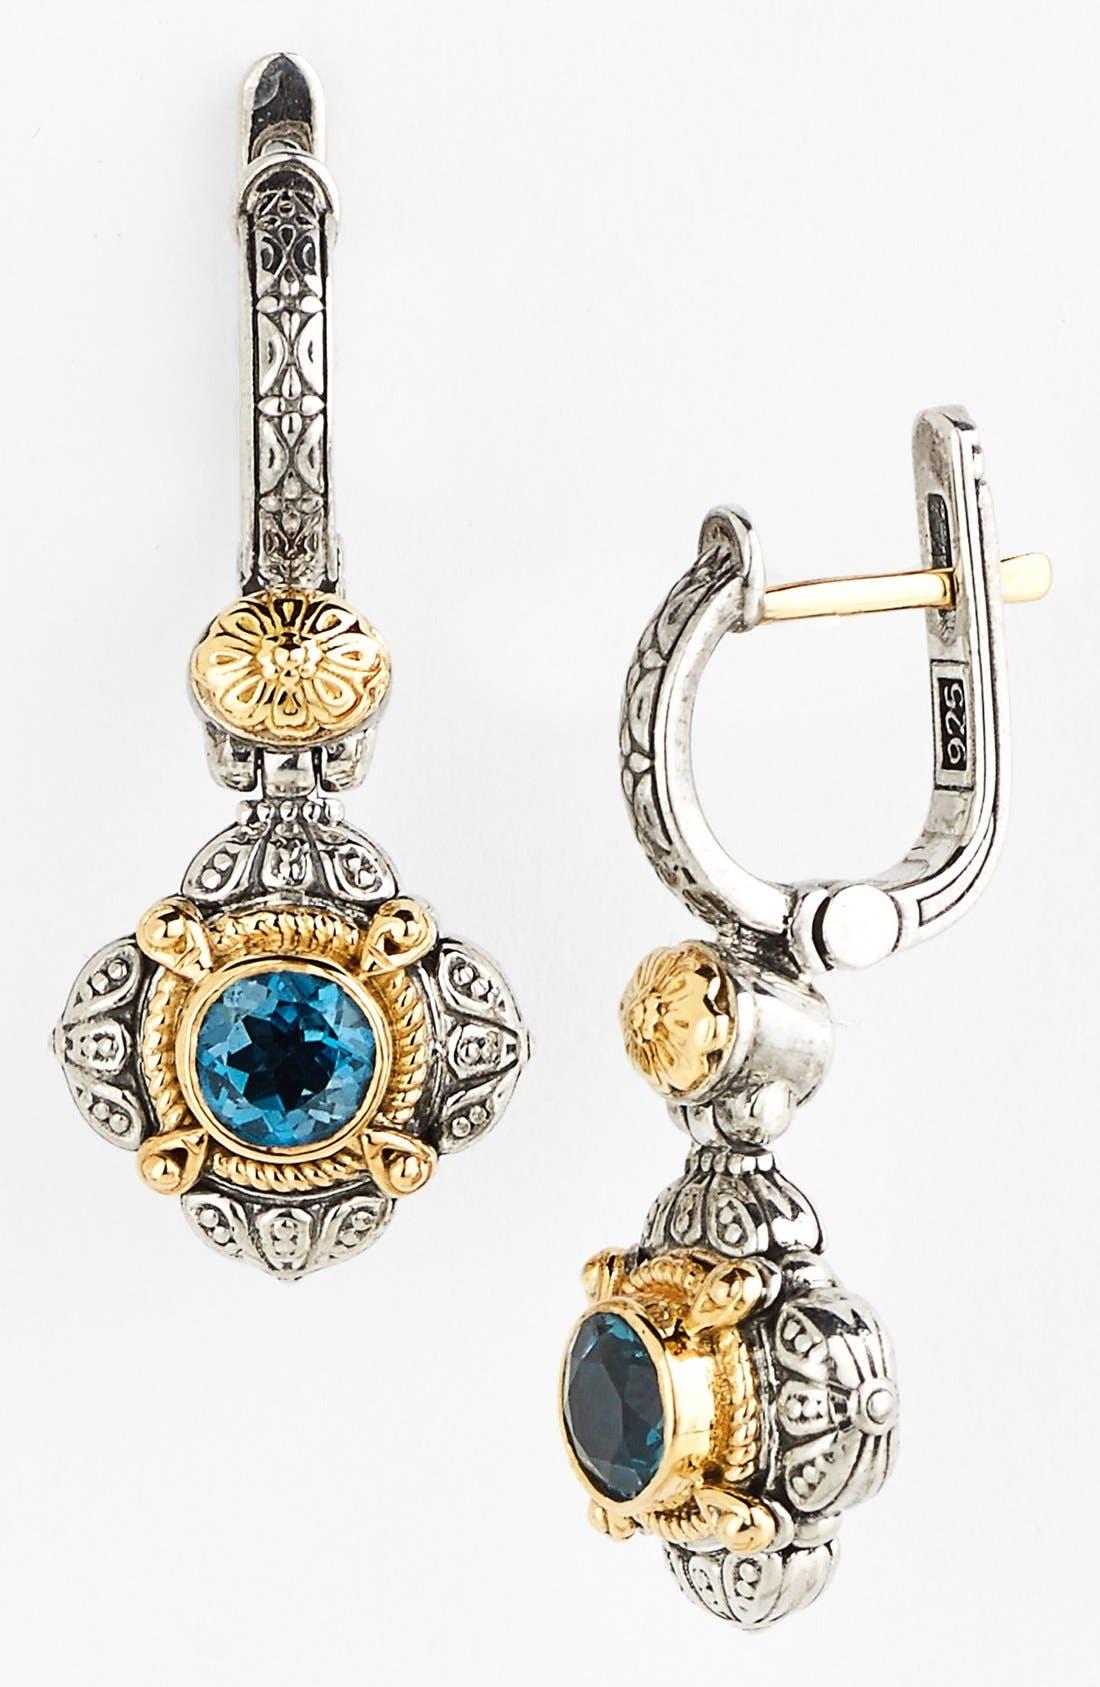 'Hermione' Drop Earrings,                             Main thumbnail 1, color,                             Silver/ Blue Topaz